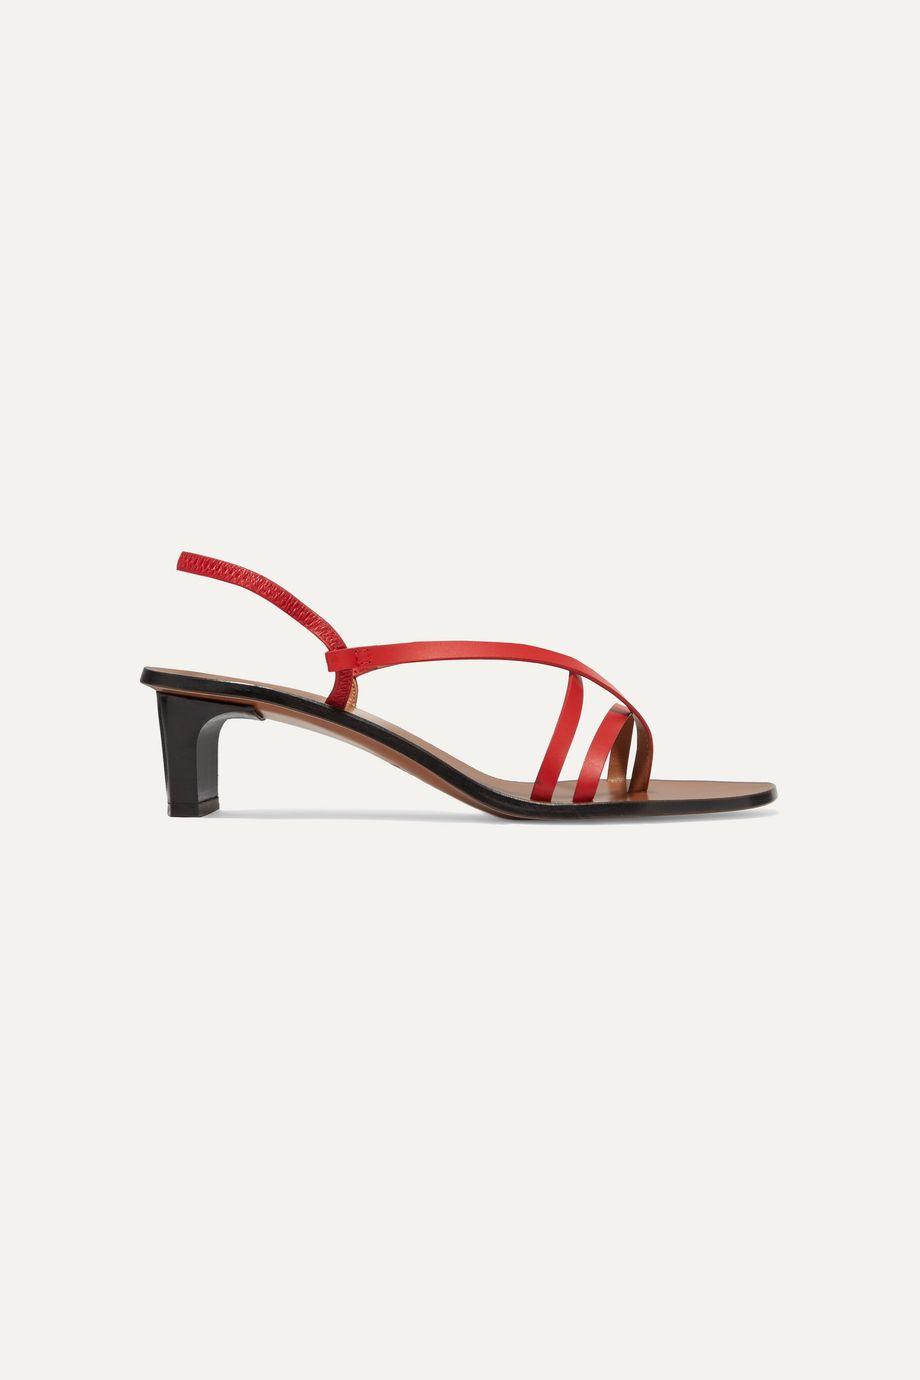 ATP Atelier Nashi leather slingback sandals